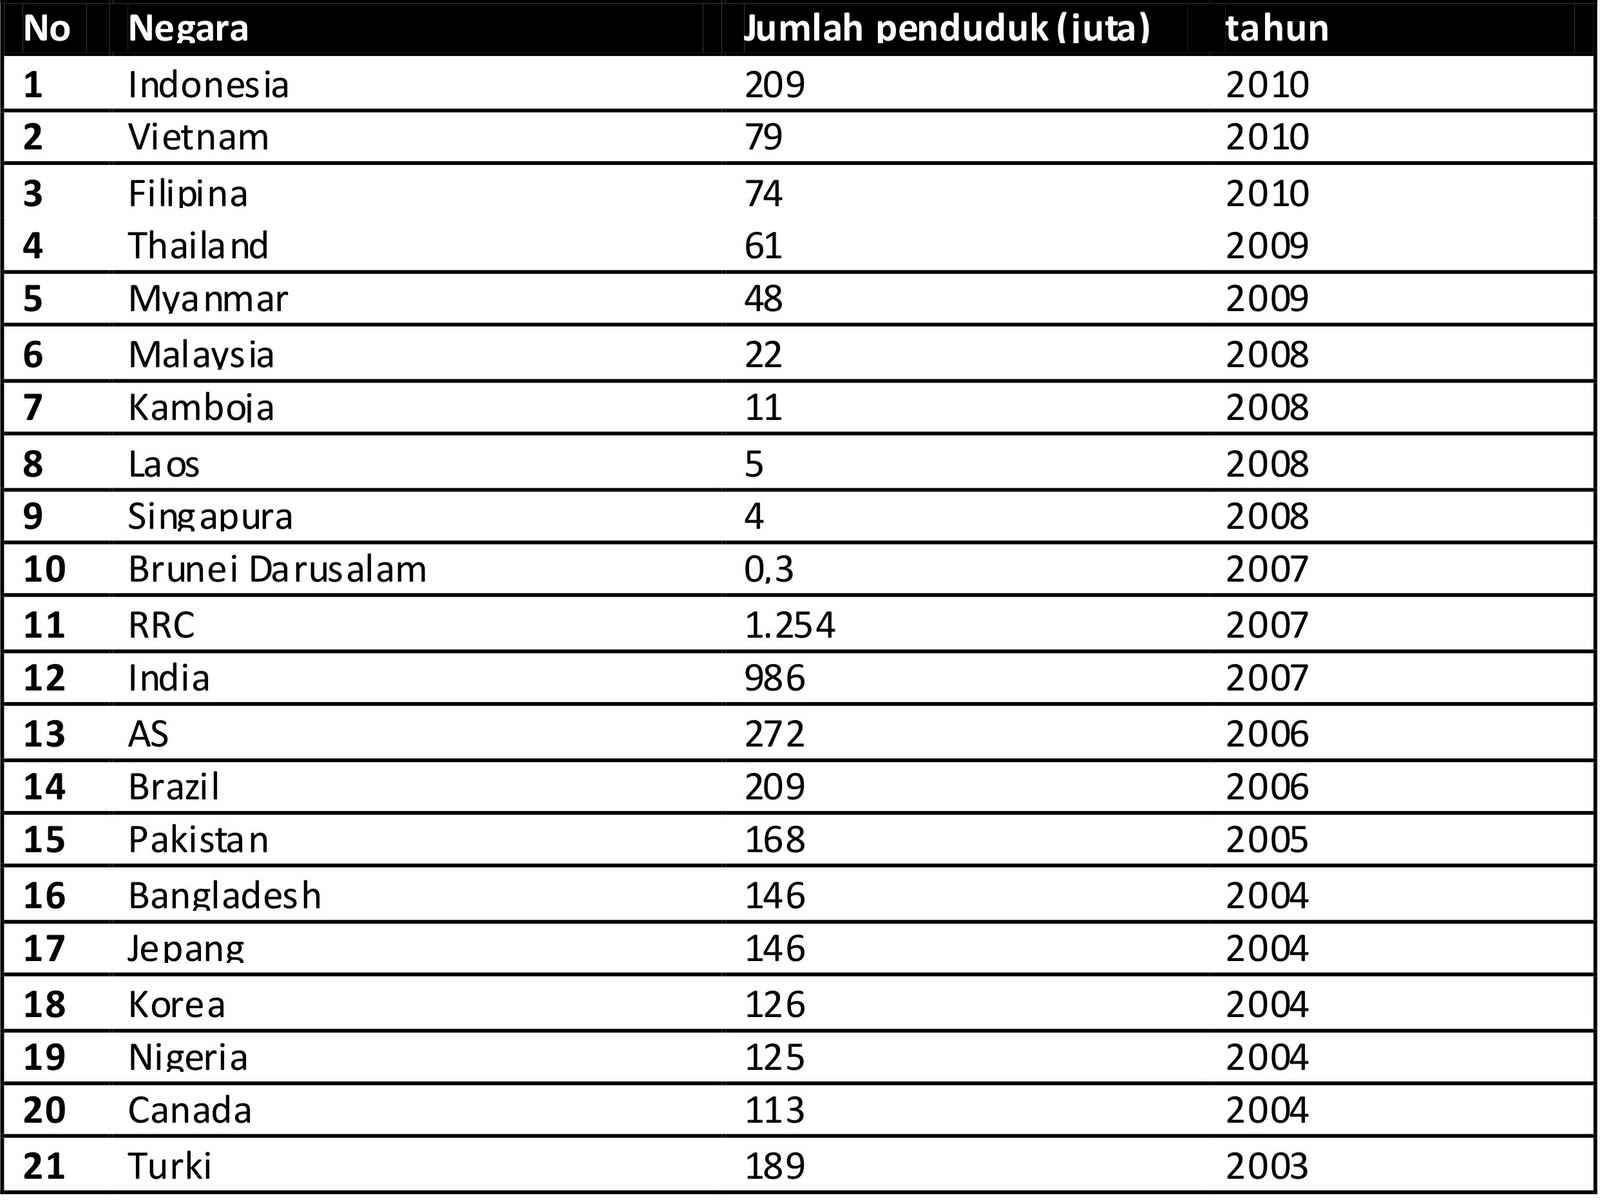 Tabel Penduduk